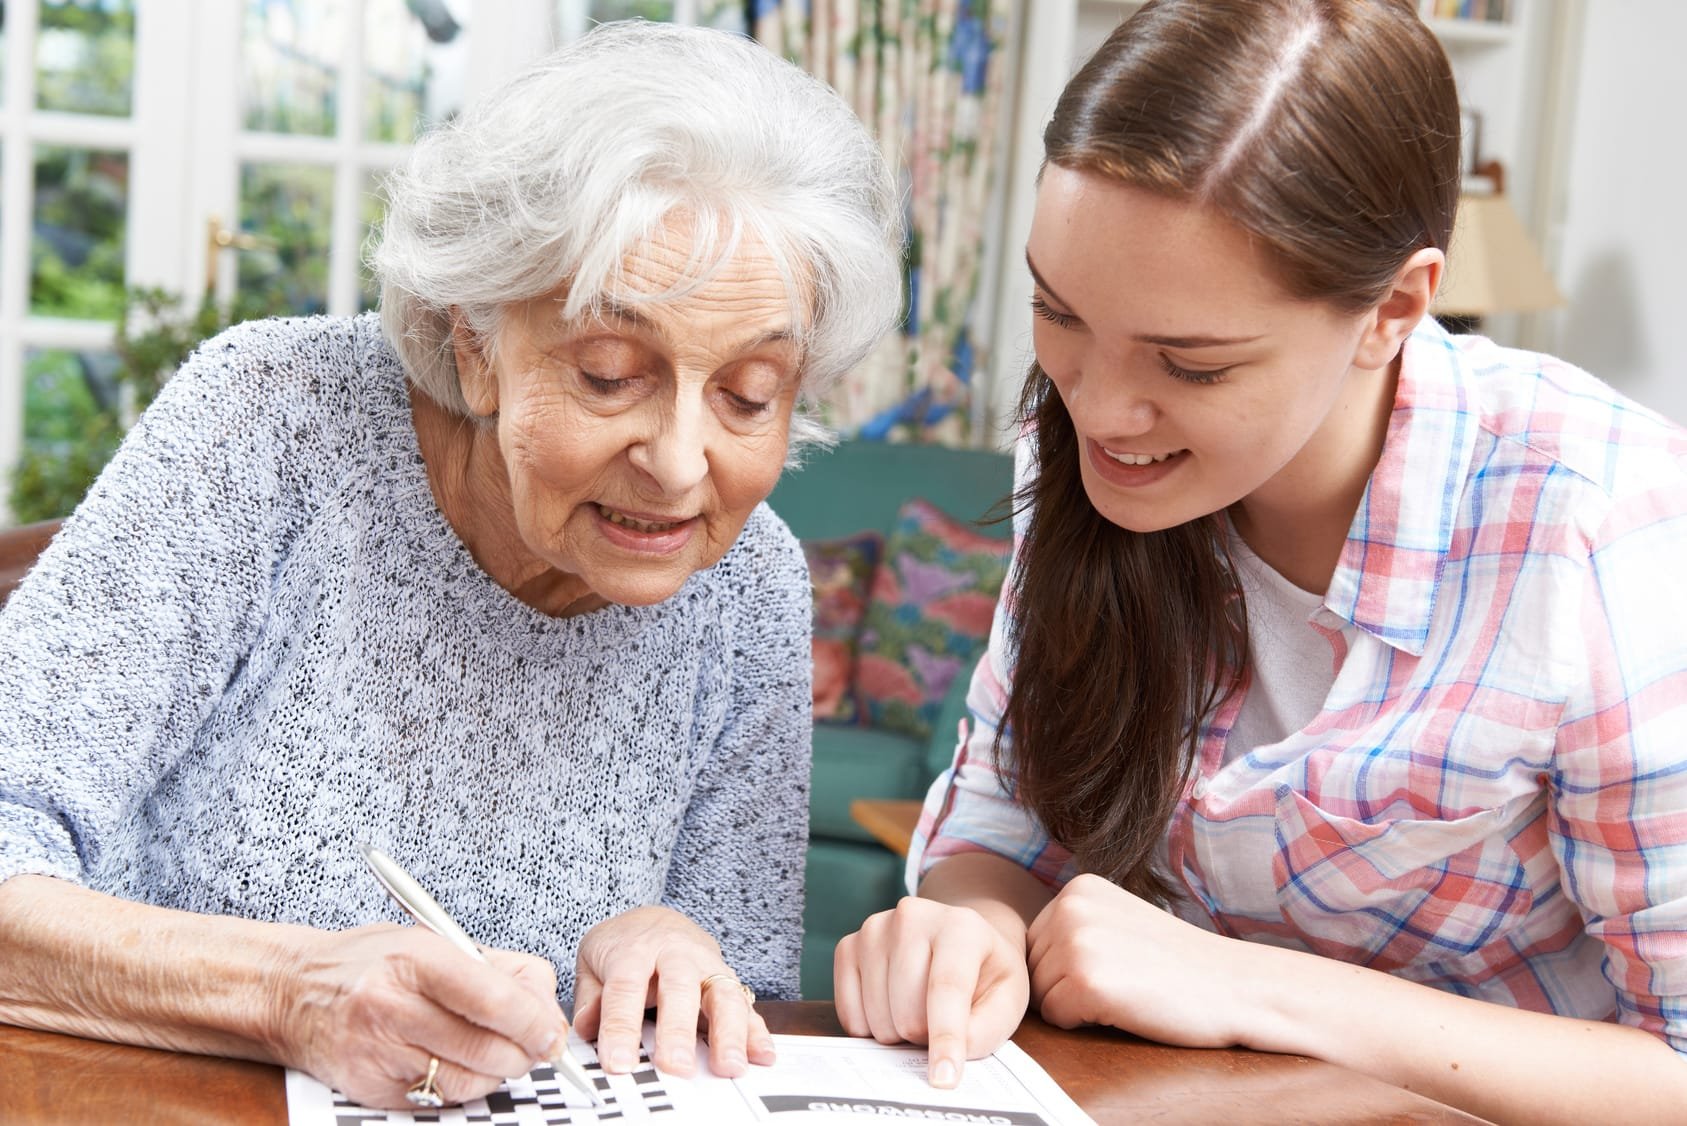 Kreuzworträtsel lösen – Demenz länger hinauszögern